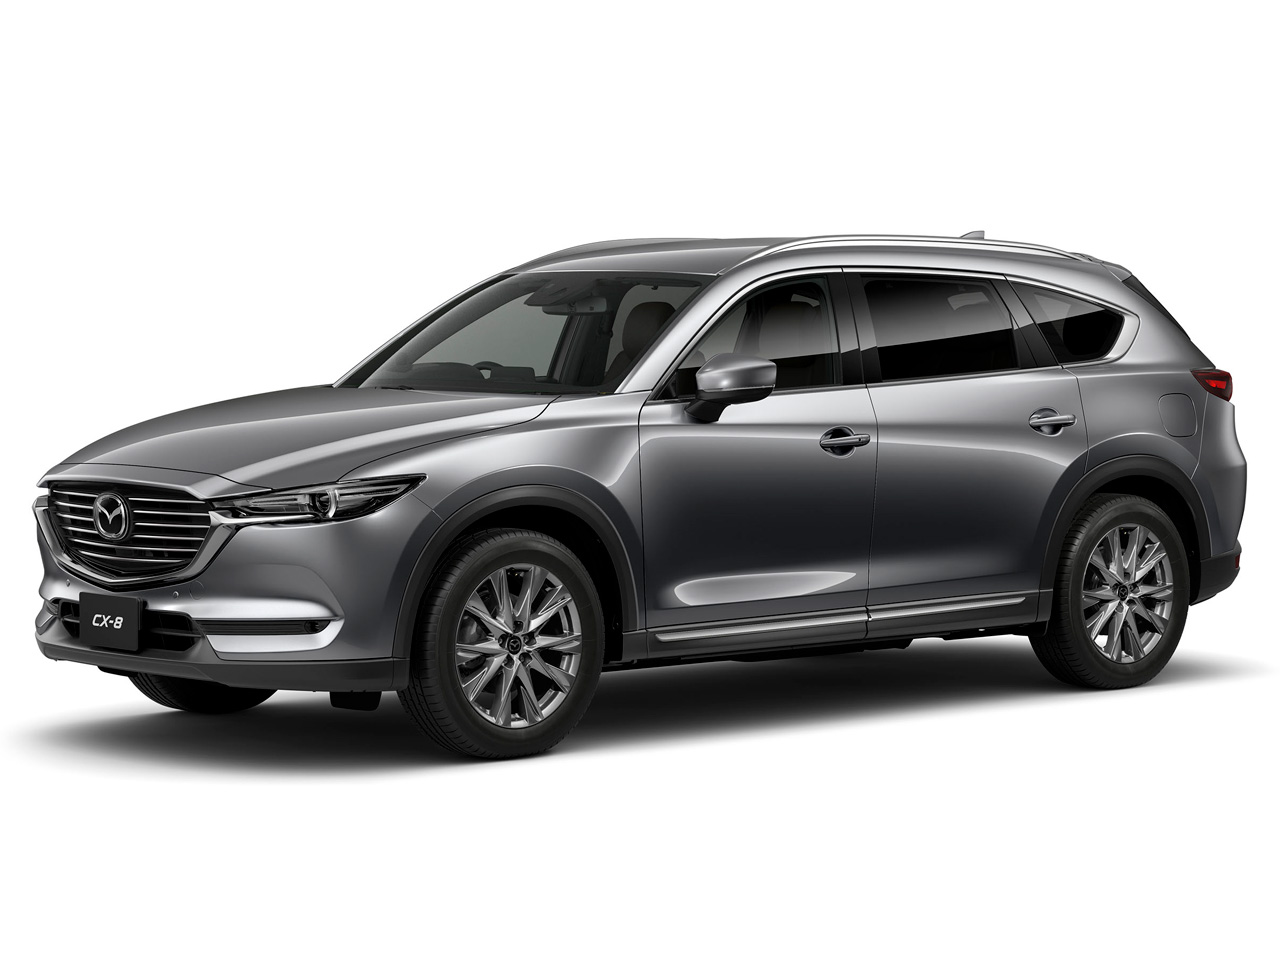 CX-8 2017年モデル の製品画像